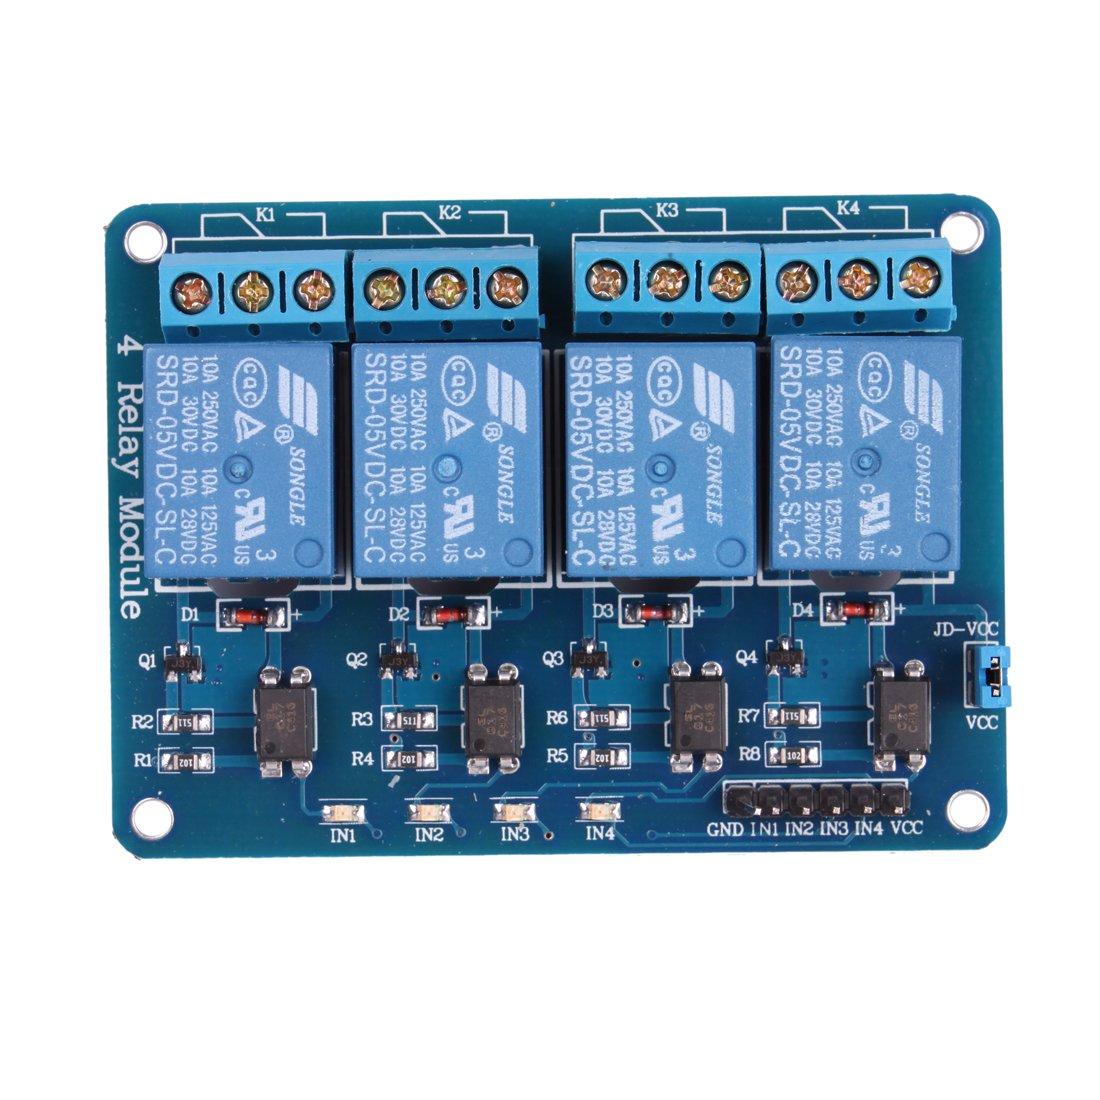 712o J5AgcL._SL1100_ amazon com jbtek 4 channel dc 5v relay module for arduino 4 relay module wiring diagram at soozxer.org